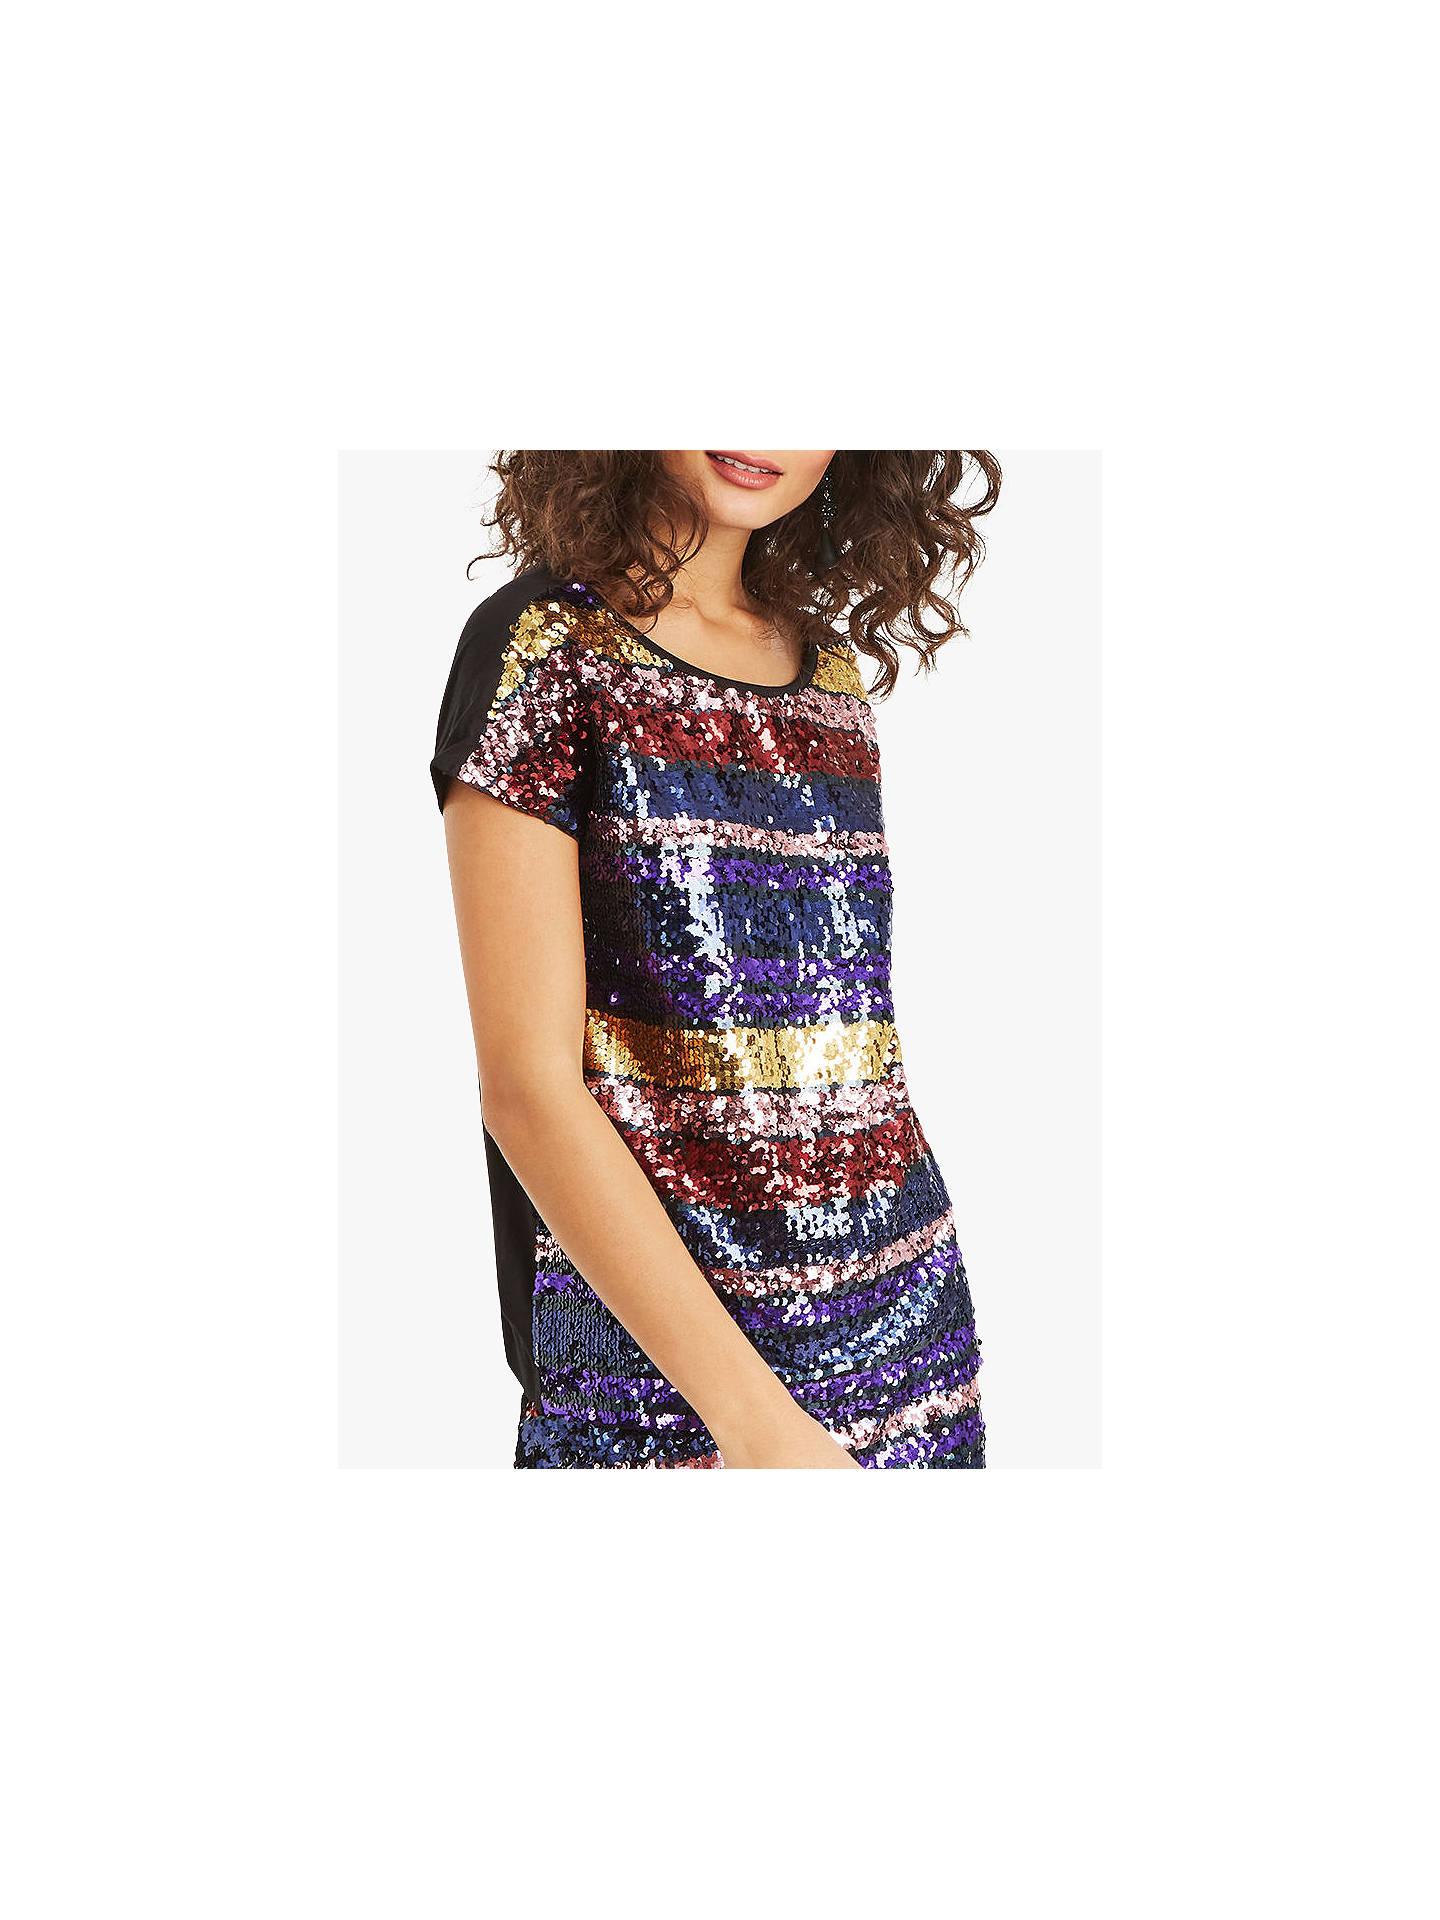 29c39c187162 Buy Oasis Rainbow Sequin T-Shirt, Multi, S Online at johnlewis.com ...